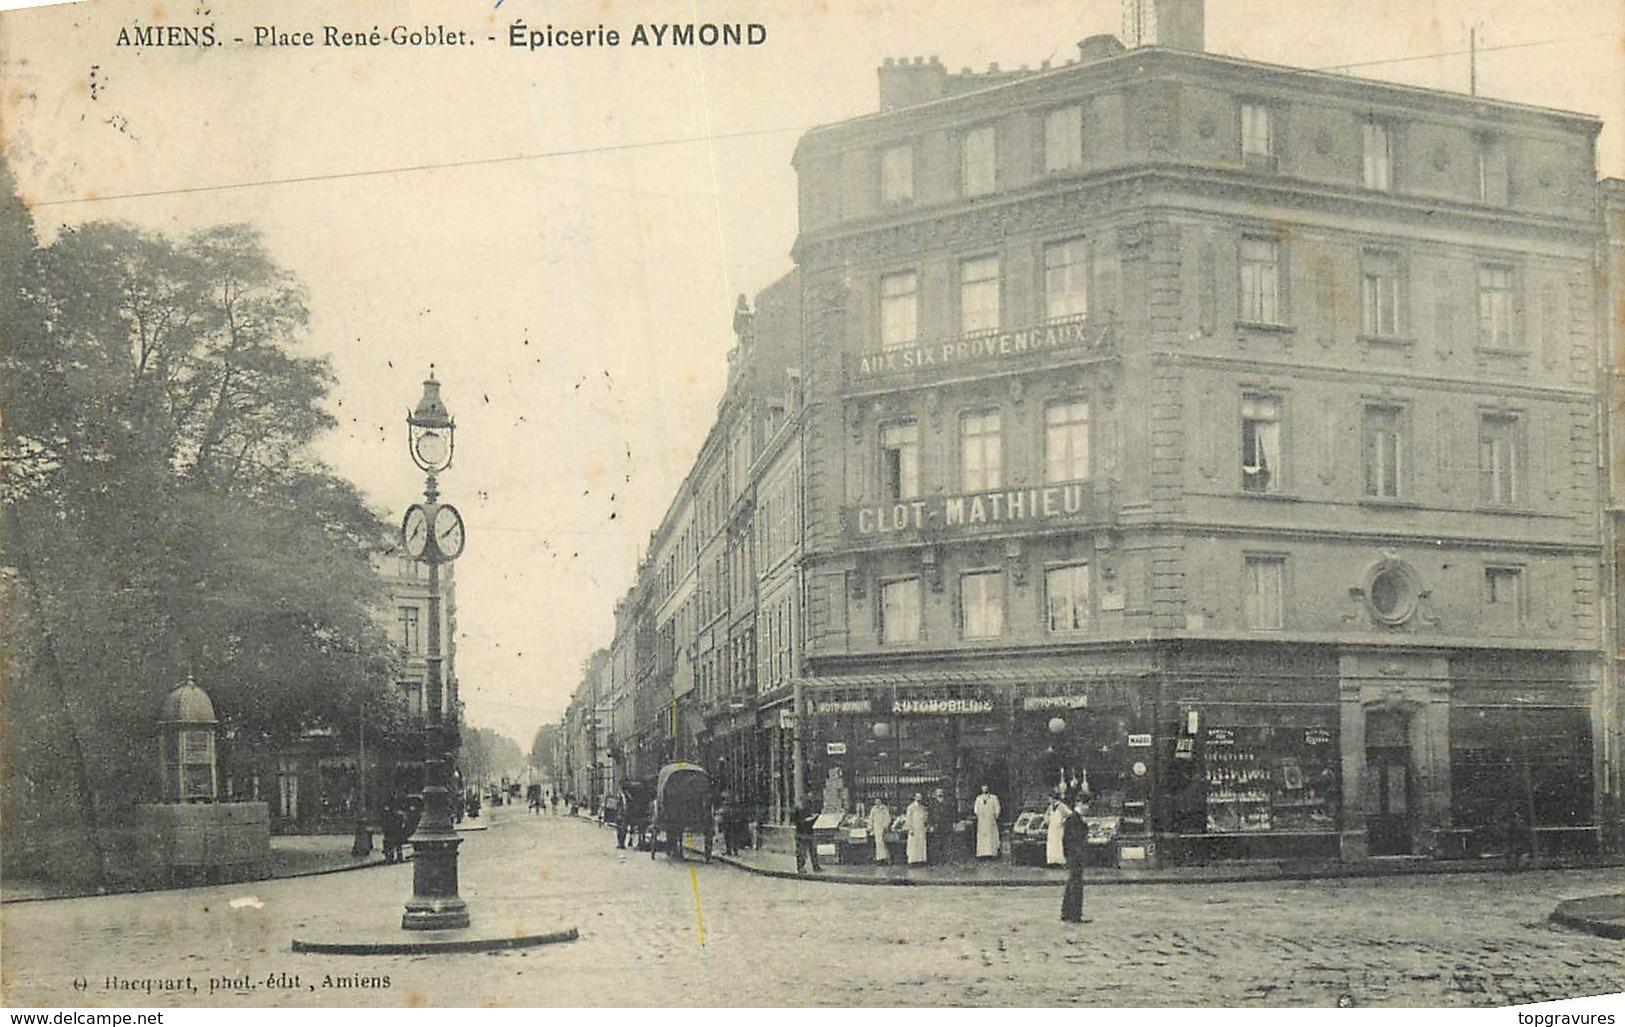 80 AMIENS PLACE RENE GOBLET EPICERIE AYMOND - Amiens